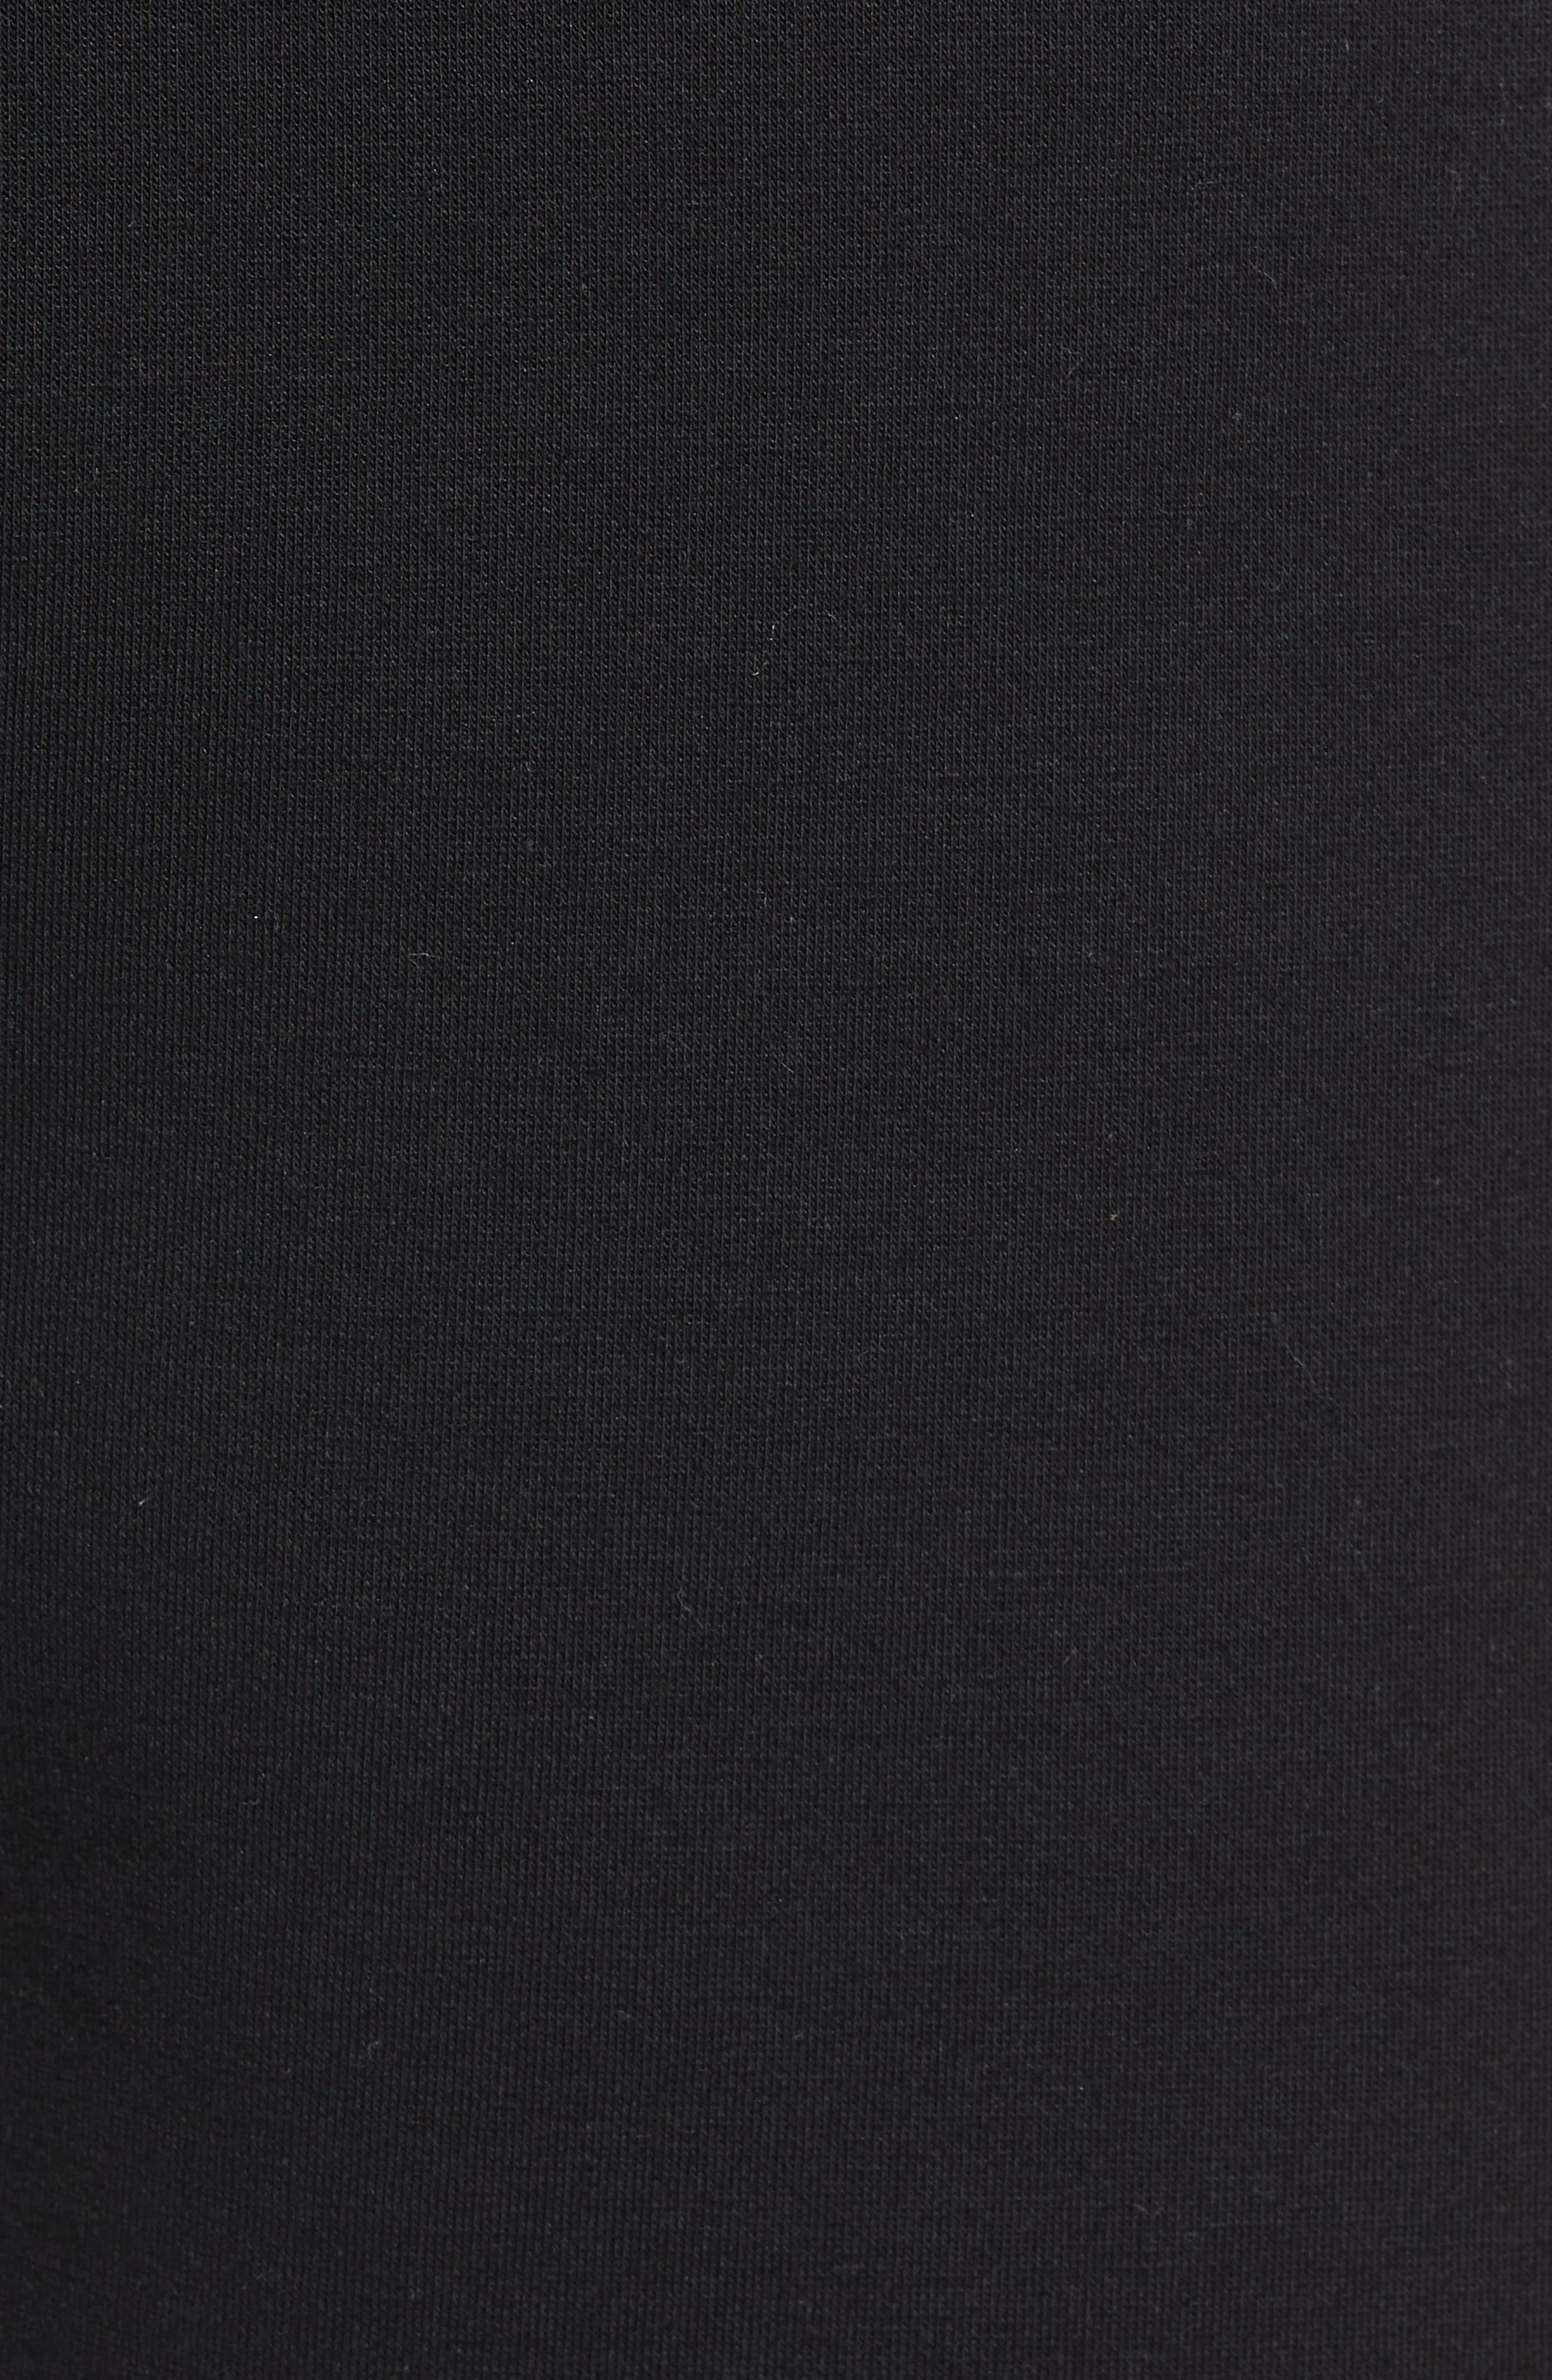 Cosmos Performance Lounge Pants,                             Alternate thumbnail 5, color,                             BLACK